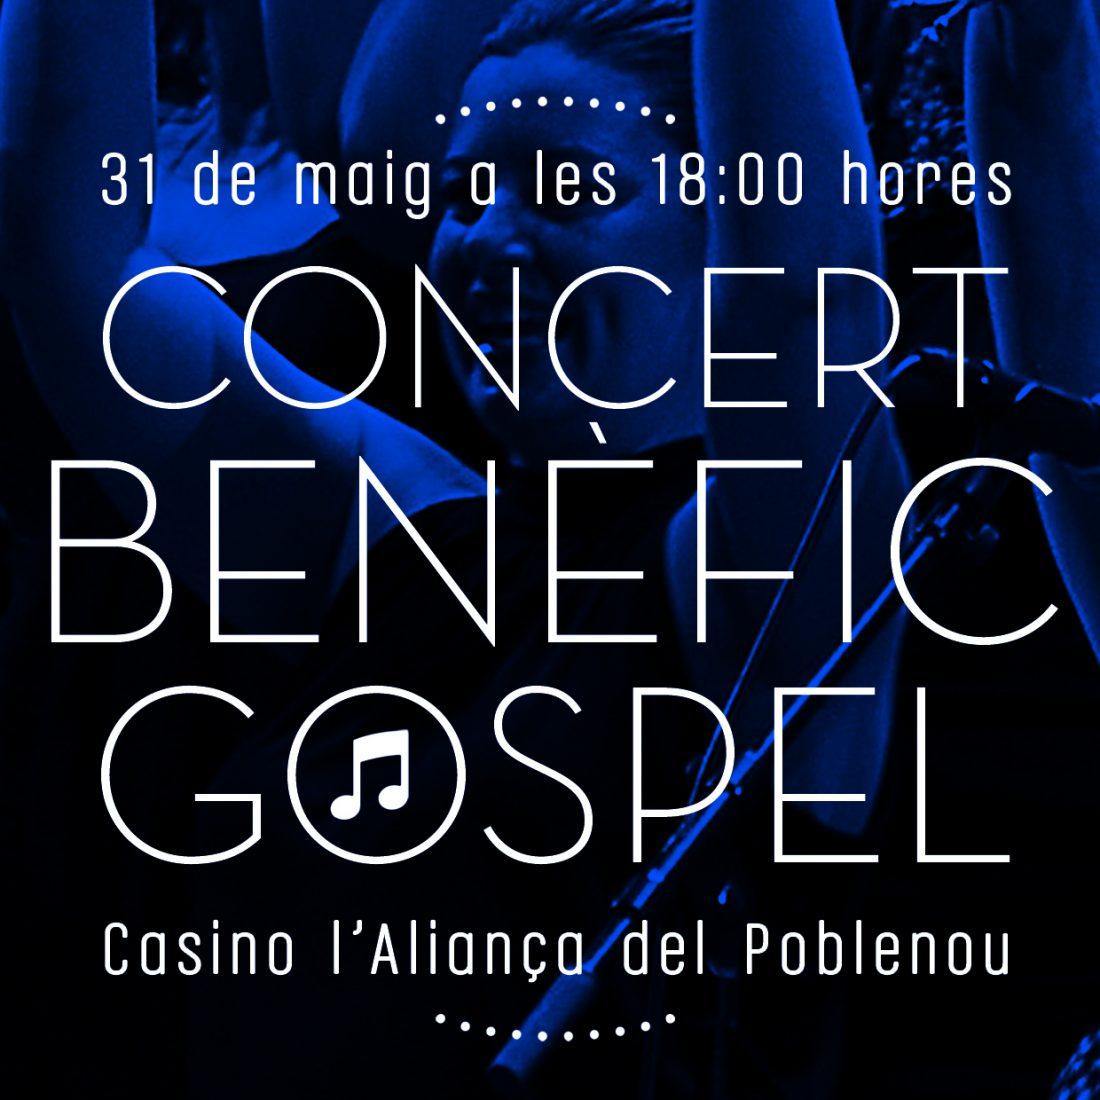 Concert Benefic Gospel Casino L'Aliança de Poblenou